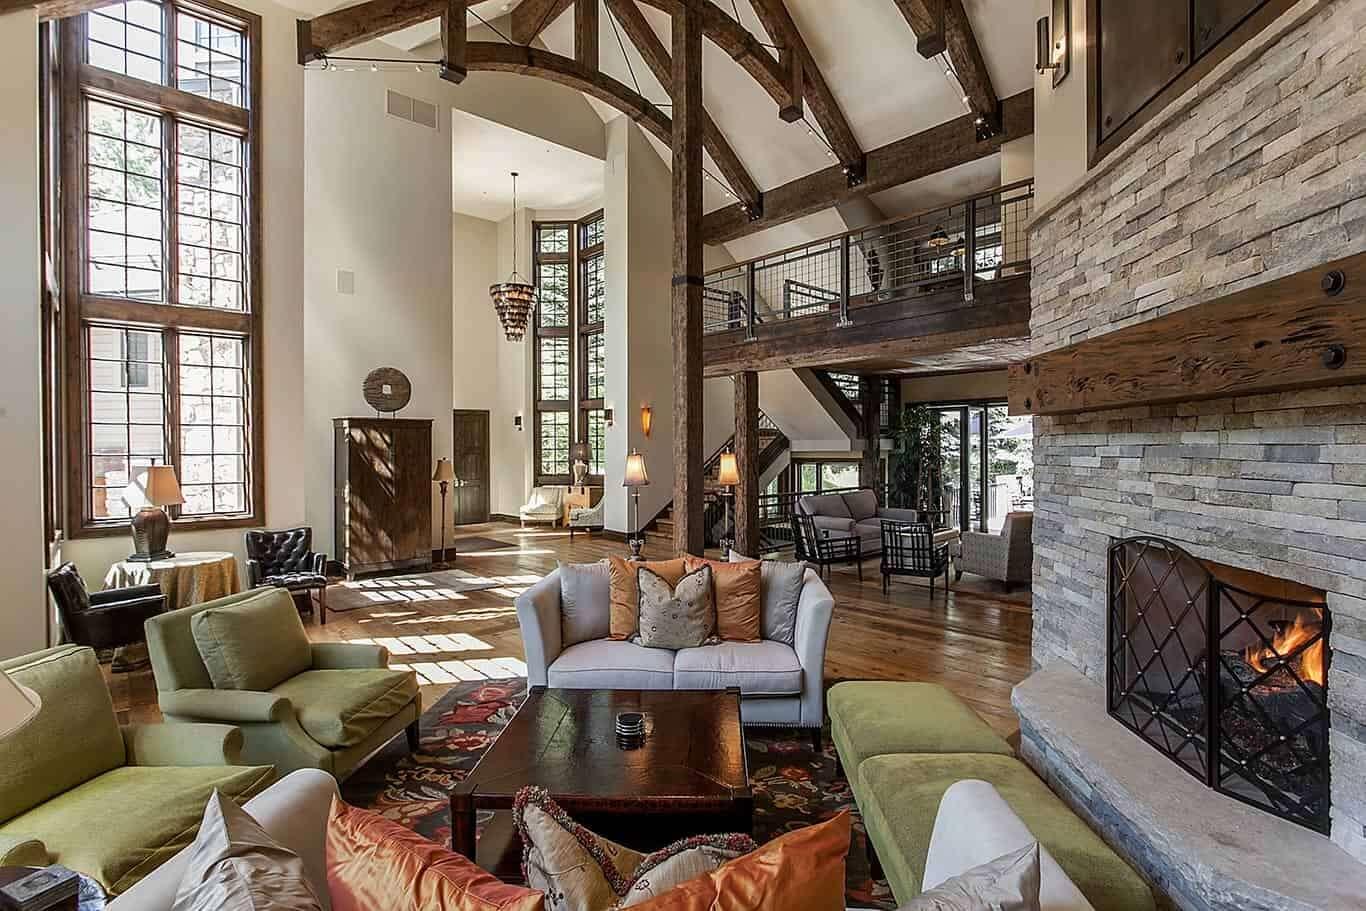 Luxury vacation rentals usa - Colorado - Beaver creek - 762 Holden Road - Image 1/39